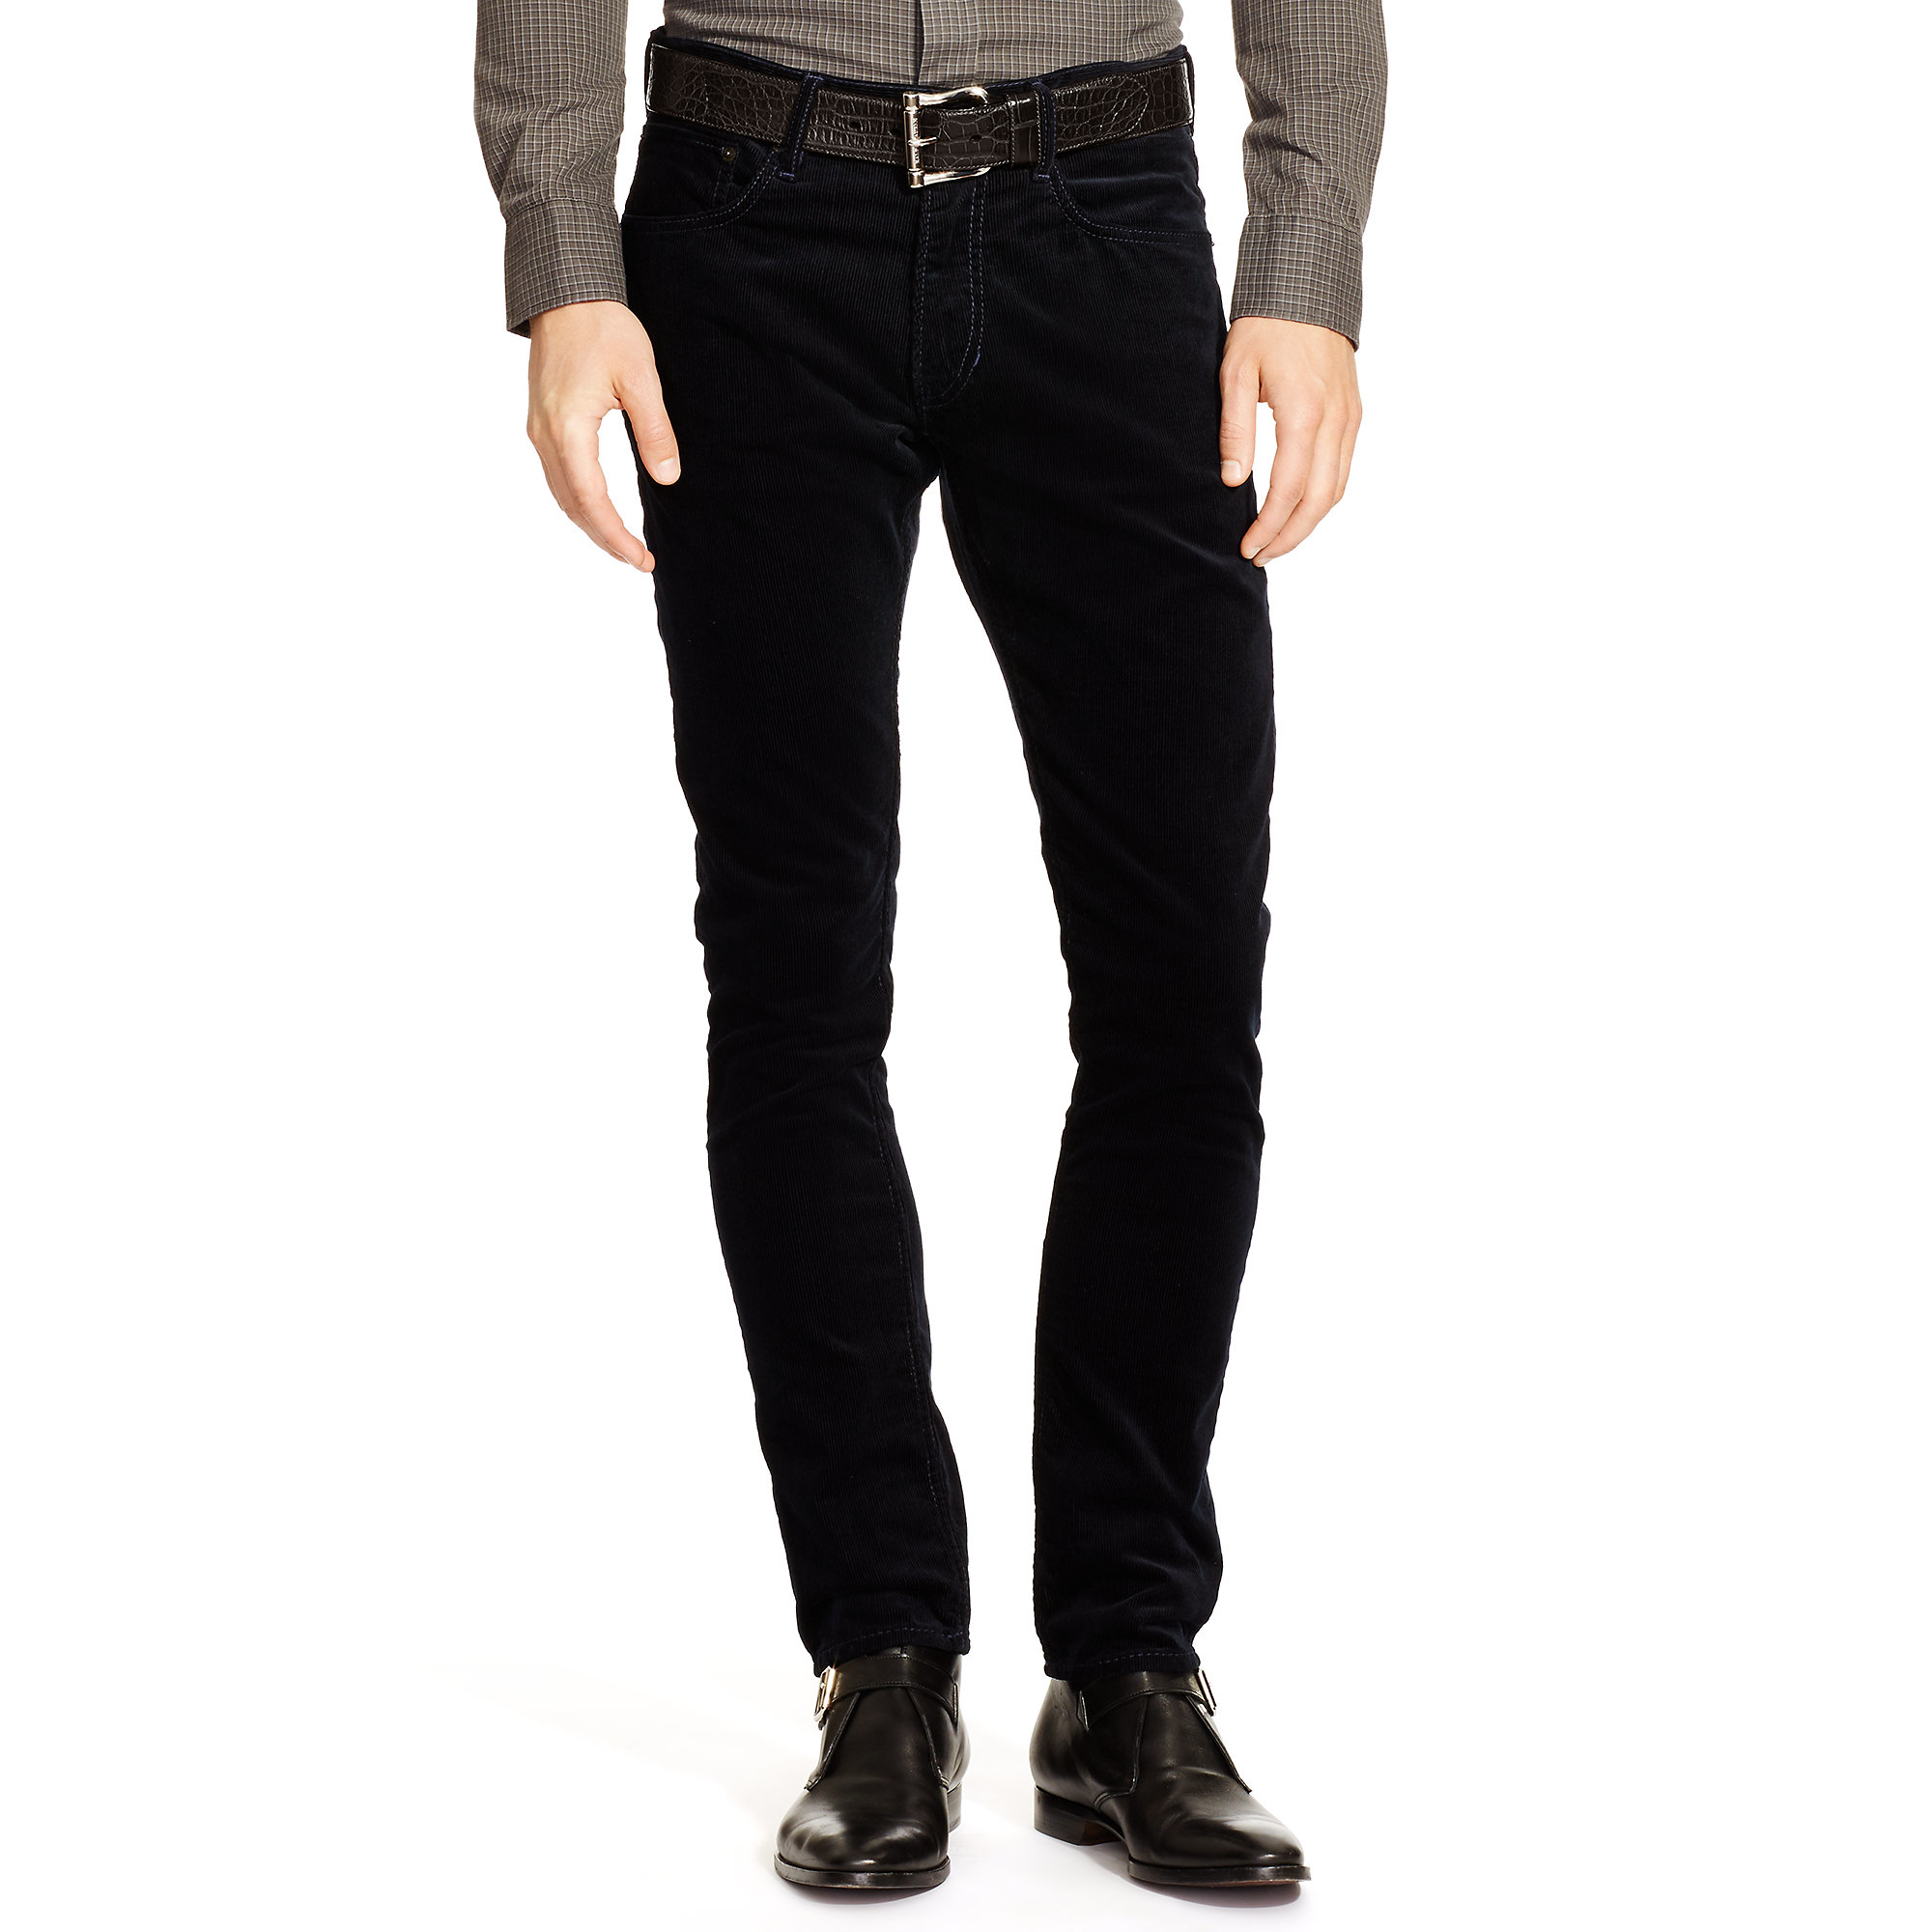 decf81e6ff047b Ralph Lauren Black Label Slim-fit Stretch Corduroy Pant in Blue for ...